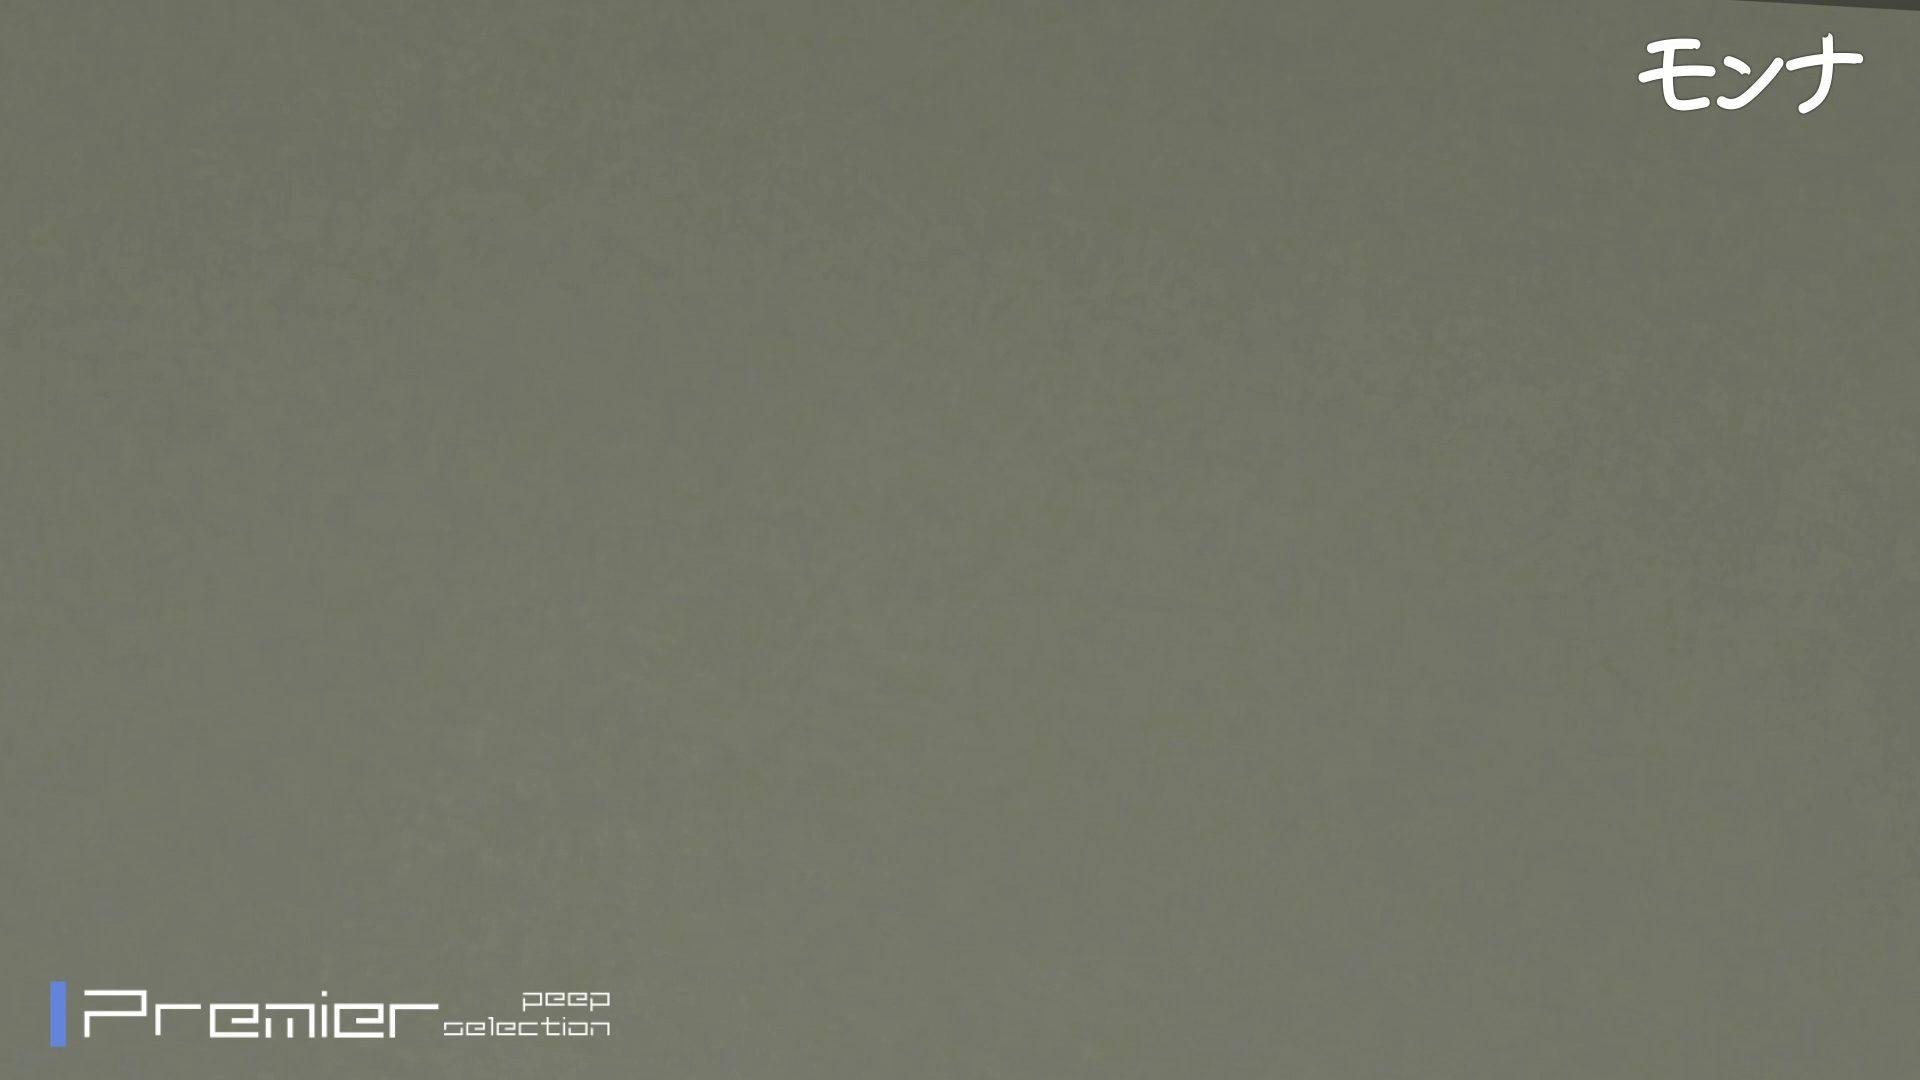 CM 悶絶シリーズ5 【美しい日本の未来 No.128】 洗面所のぞき オメコ動画キャプチャ 111枚 77